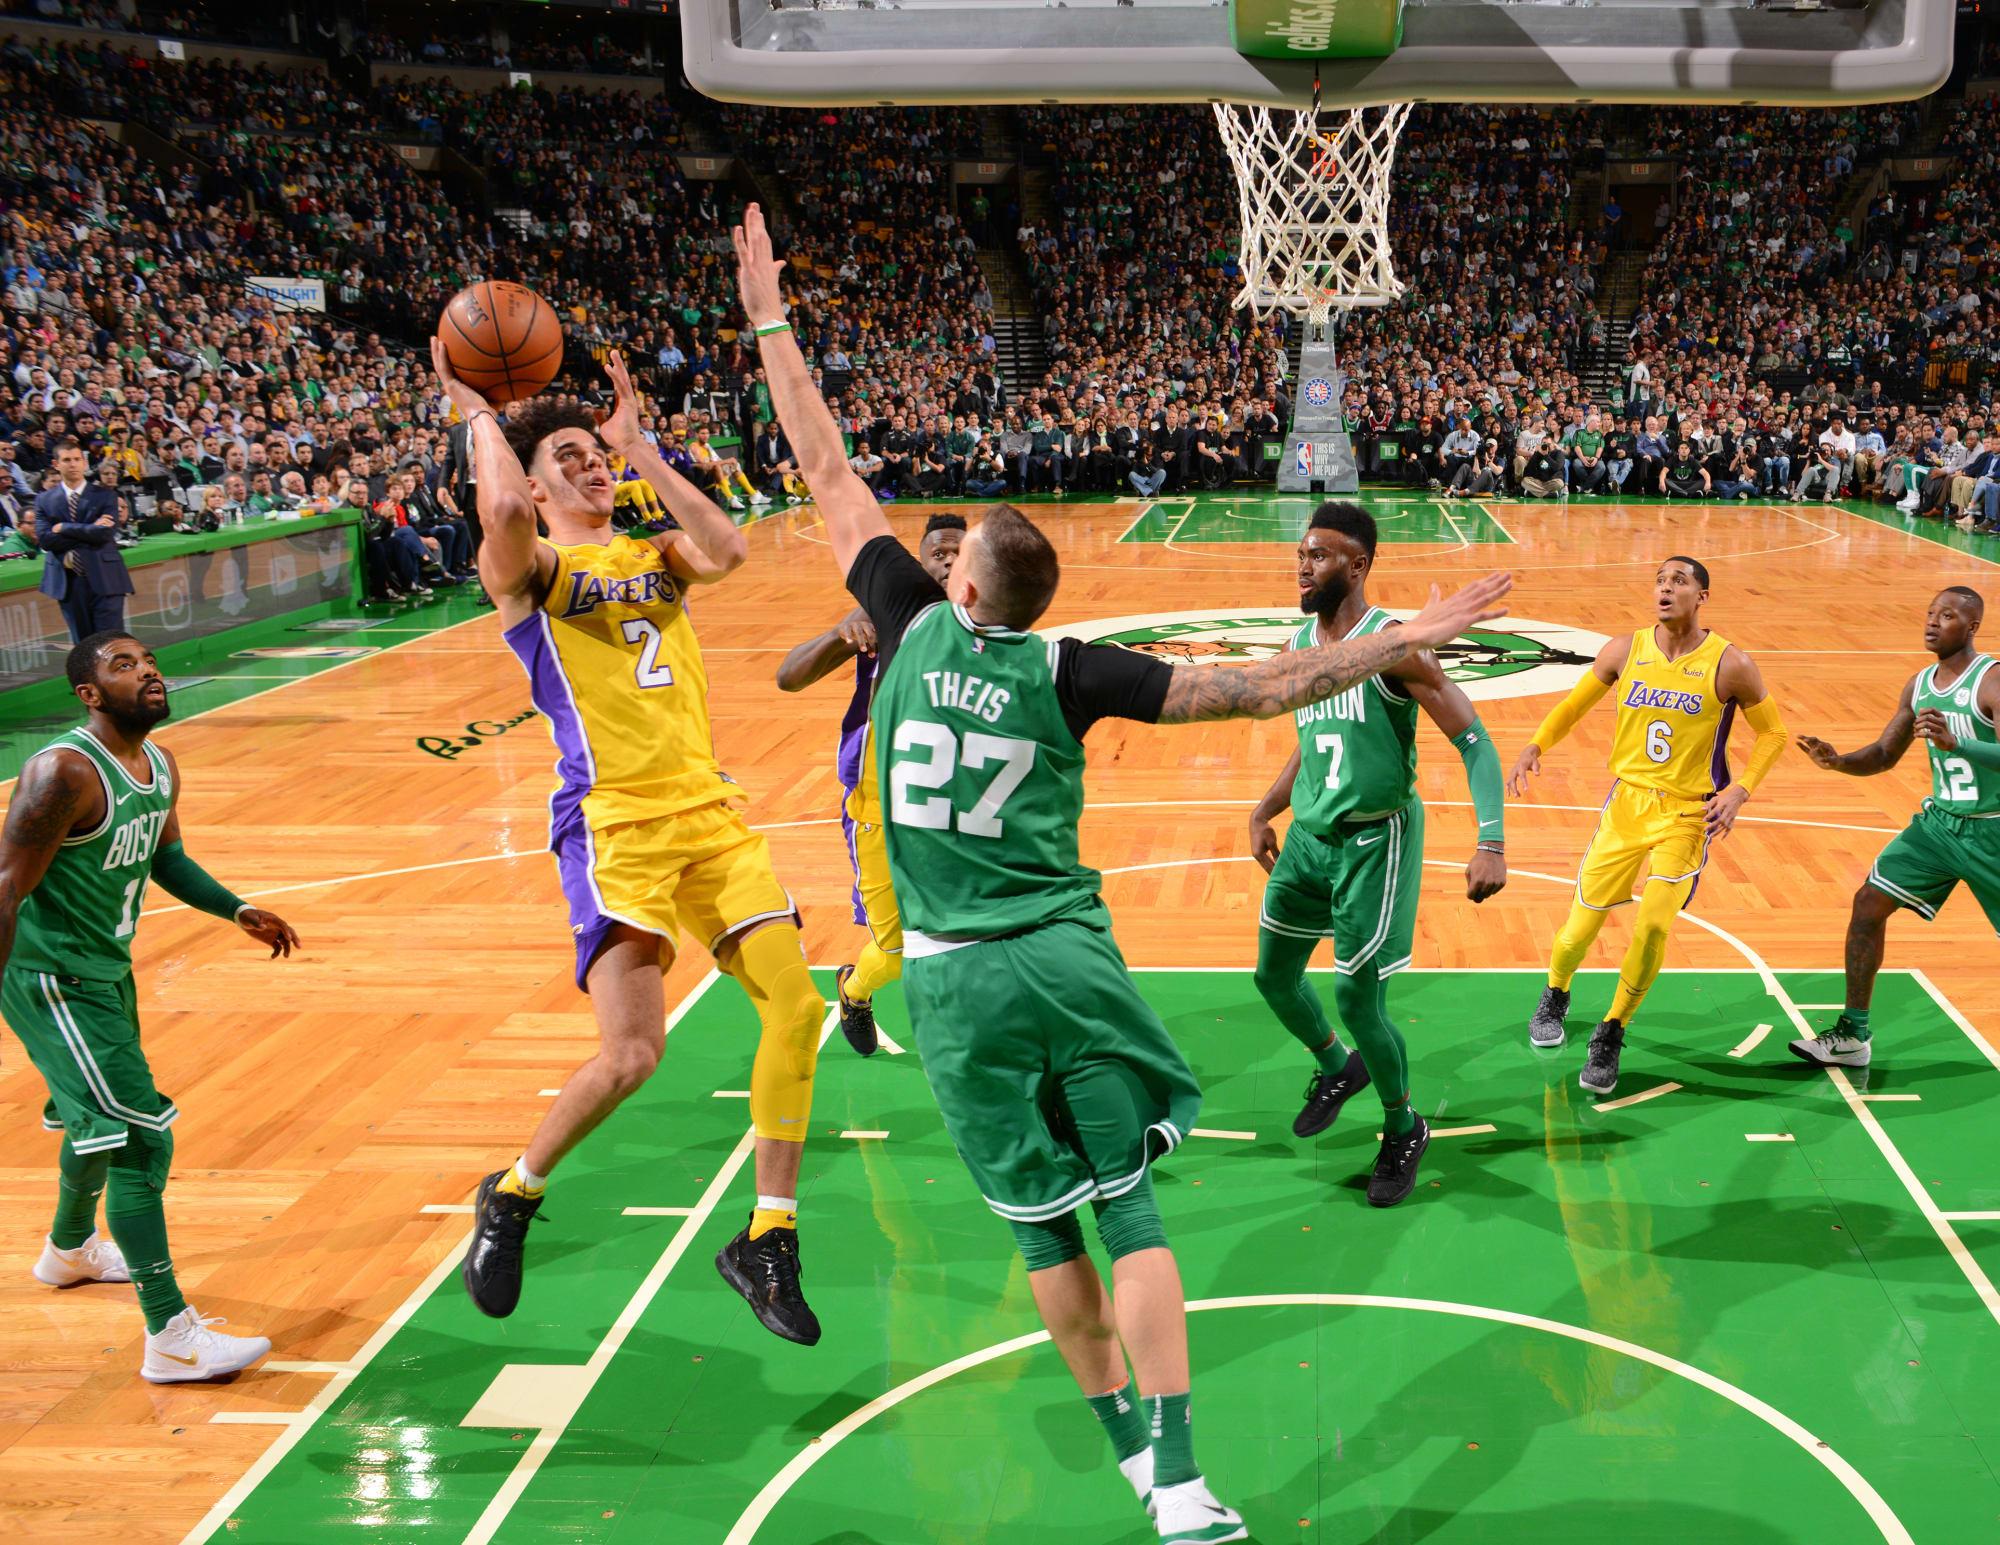 Los Angeles Lakers Vs Boston Celtics Recap And Highlights